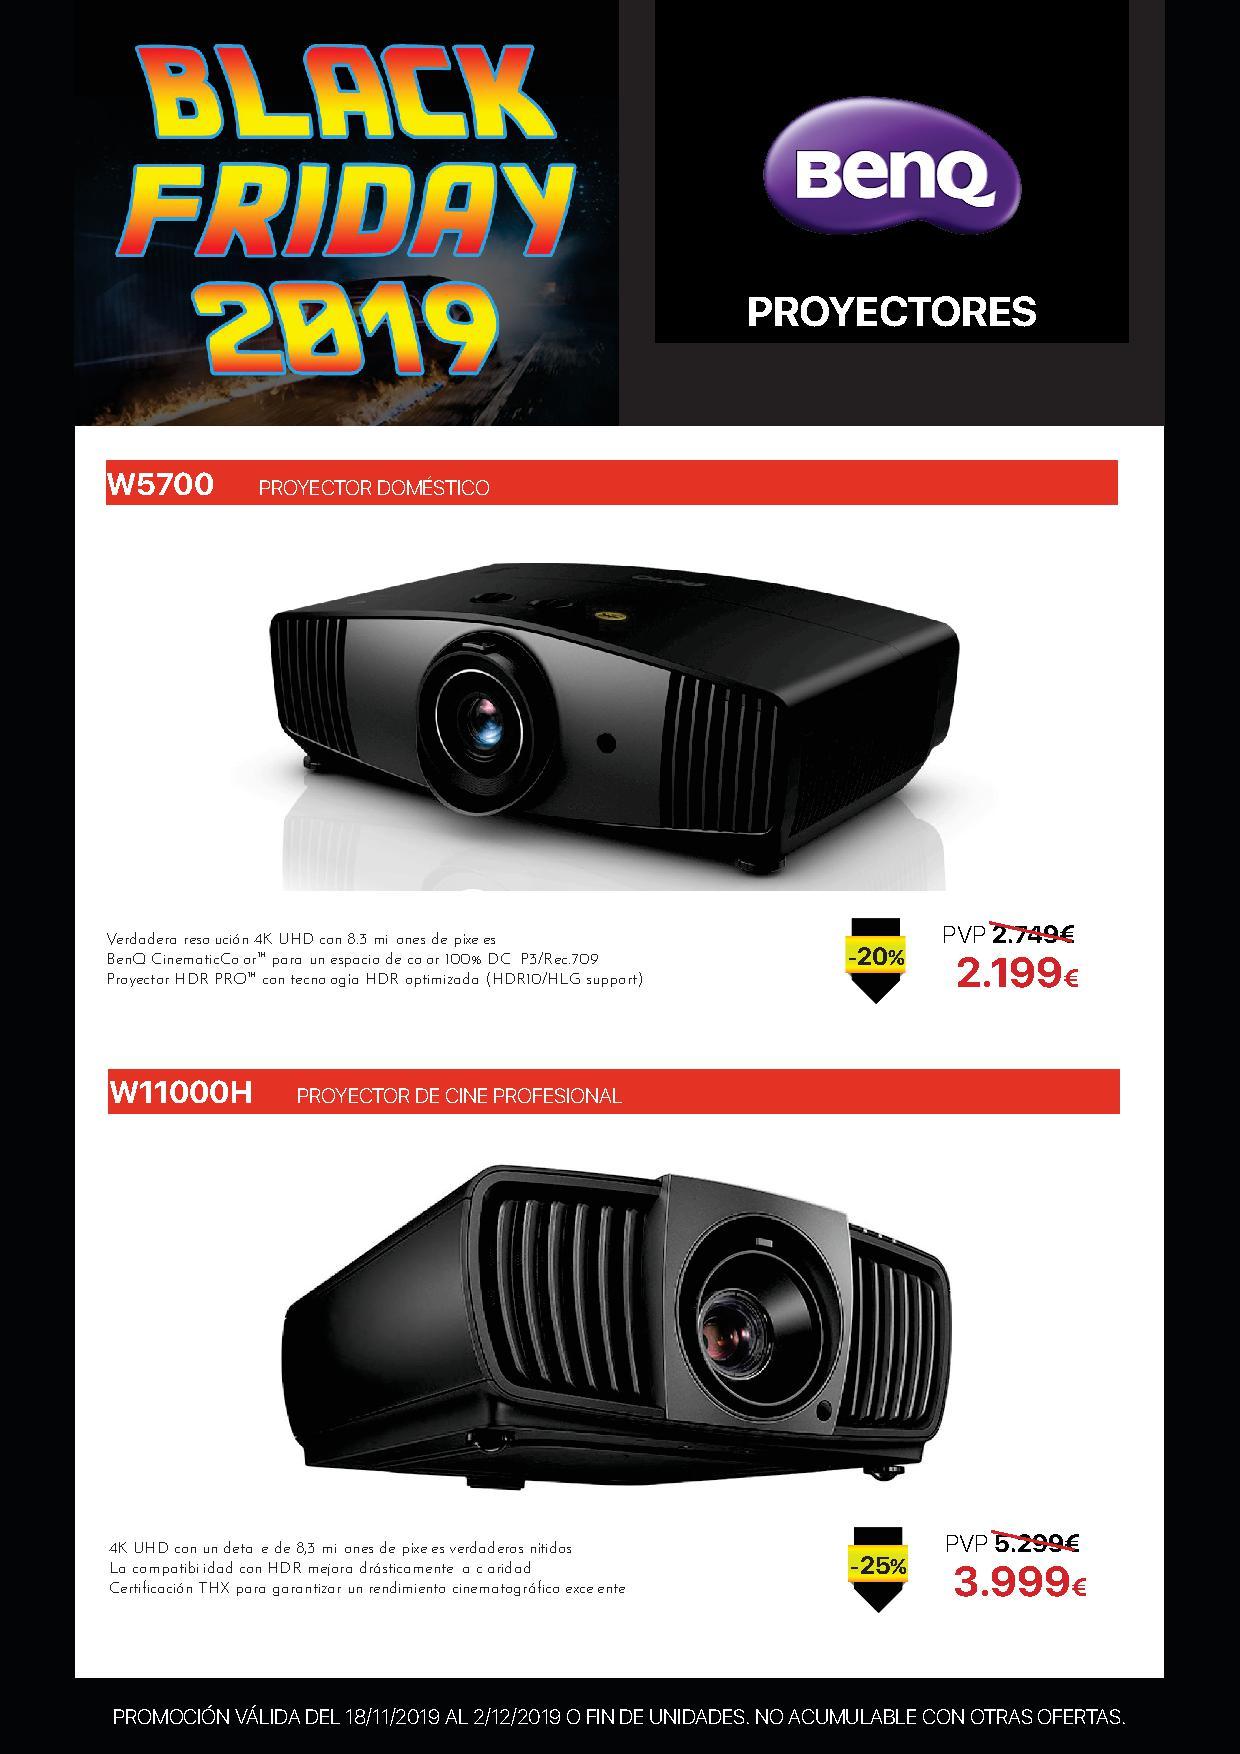 benq black friday 2019